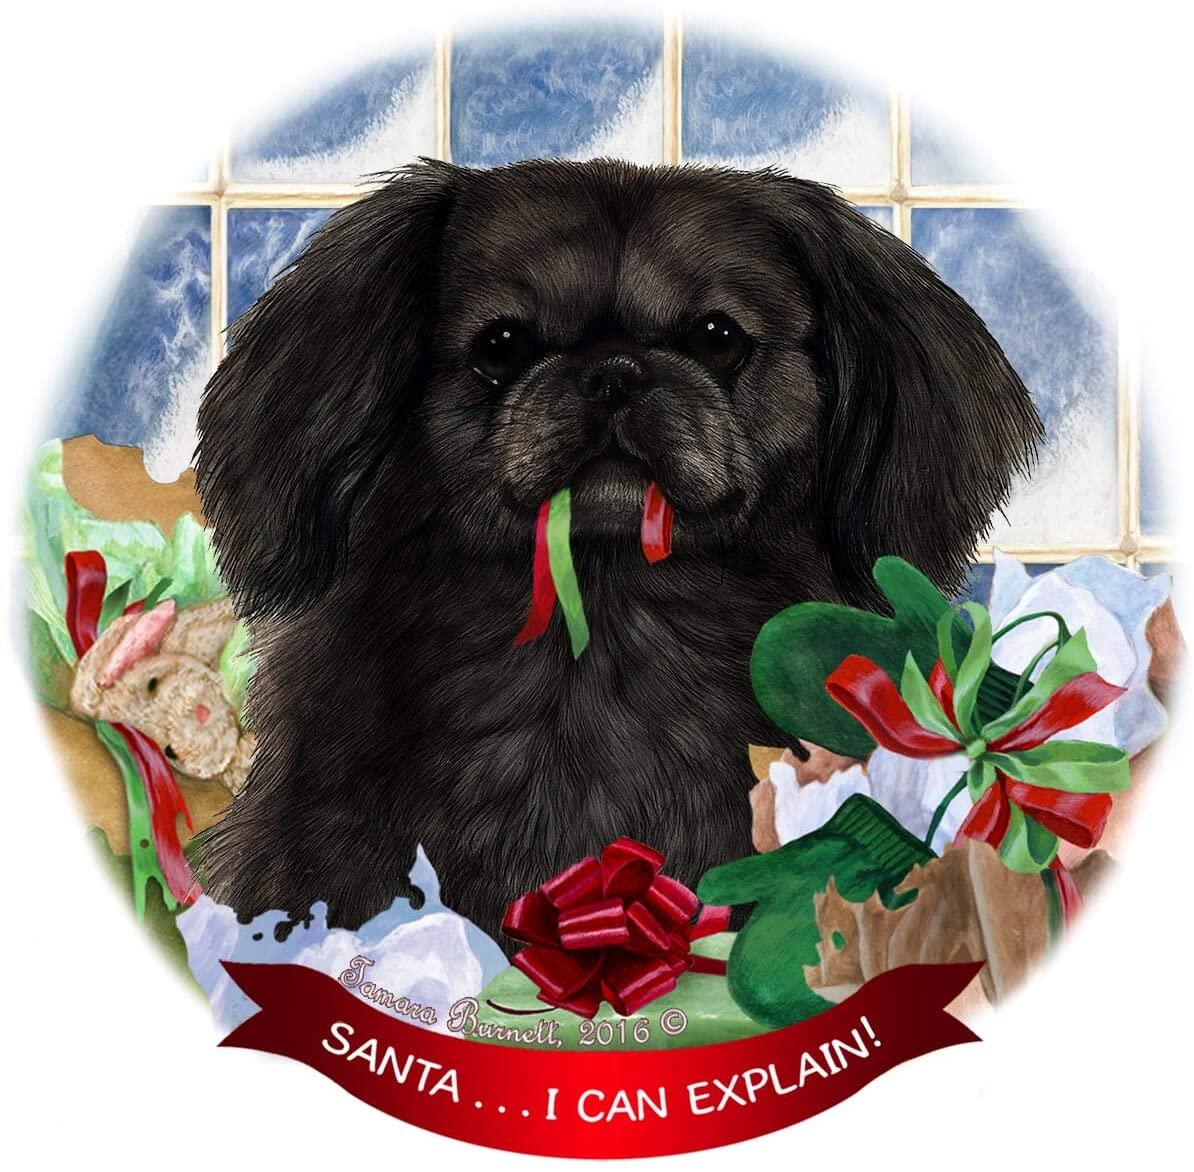 Pekingese Black Dog Porcelain Ornament Pet Gift 'Santa. I Can Explain!'